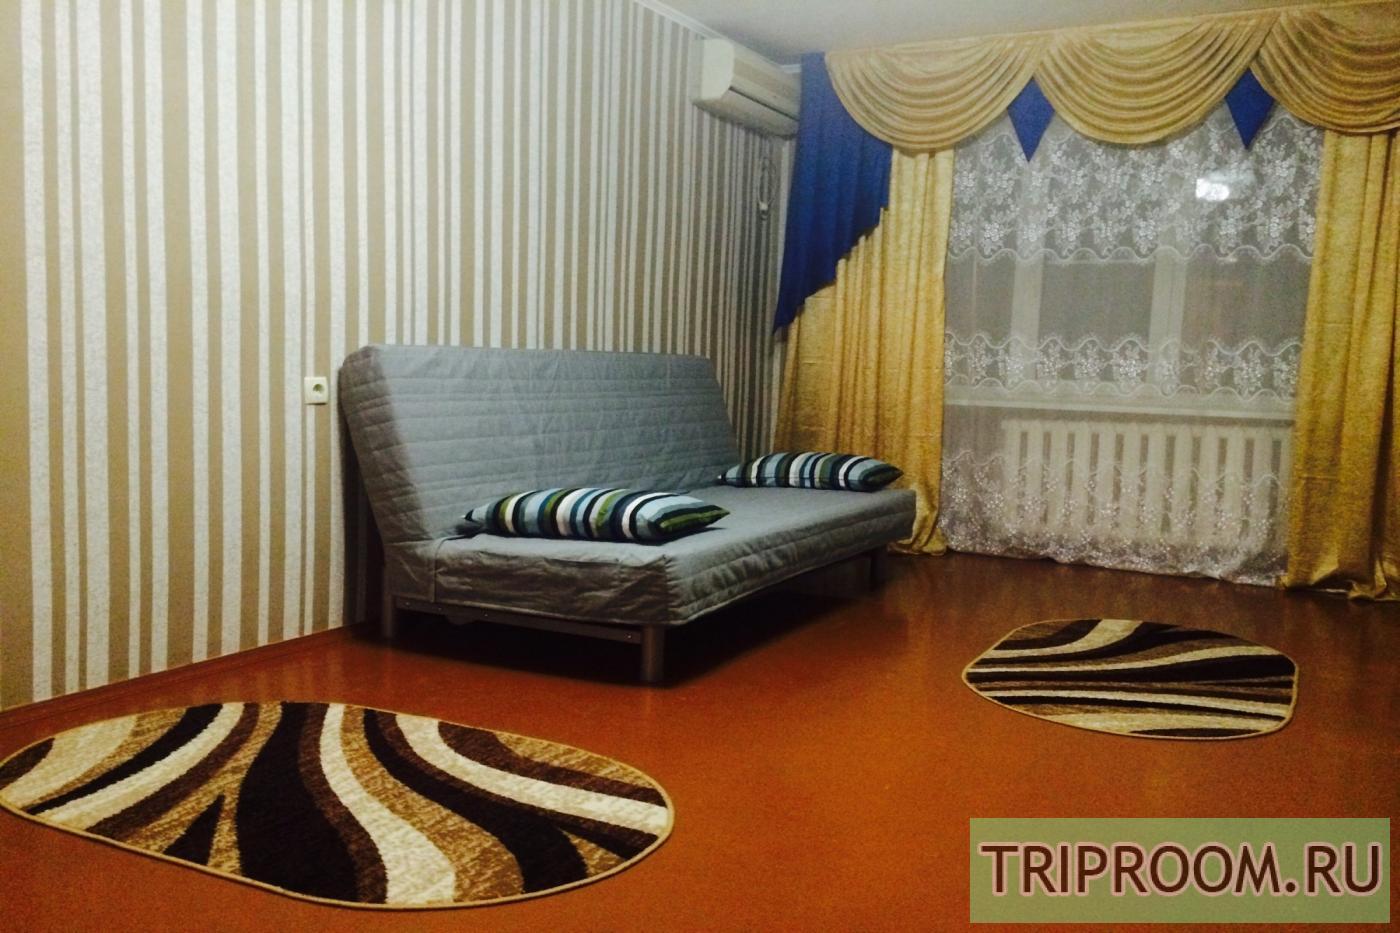 3-комнатная квартира посуточно (вариант № 33462), ул. Оганова улица, фото № 12